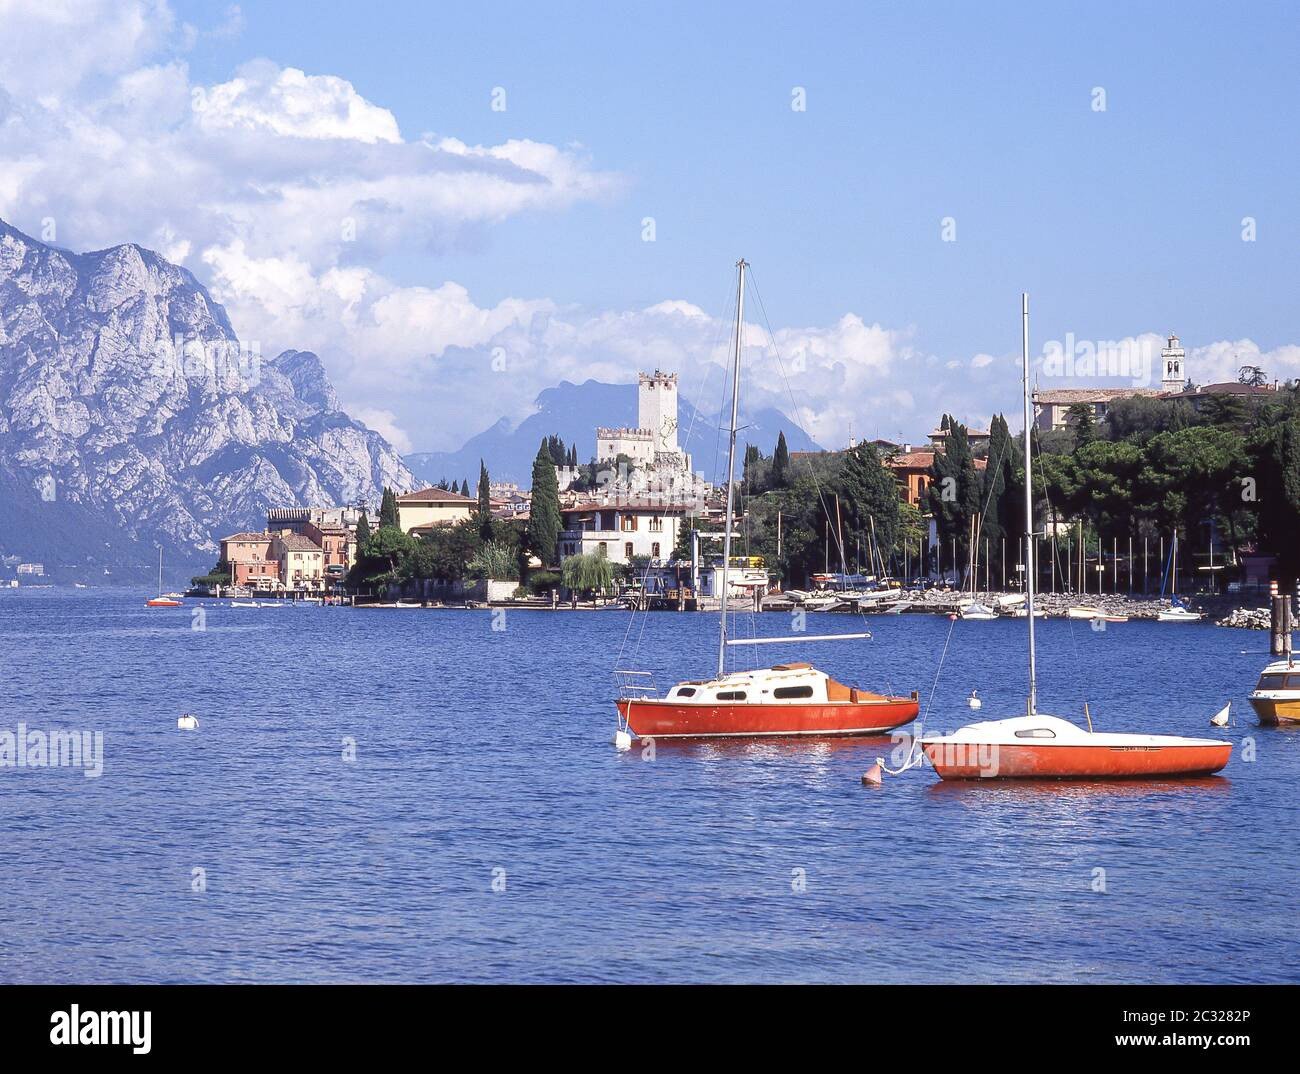 Boats in harbour on Lake Garda, Malcsene, Verona Province, Veneto Region, Italy Stock Photo